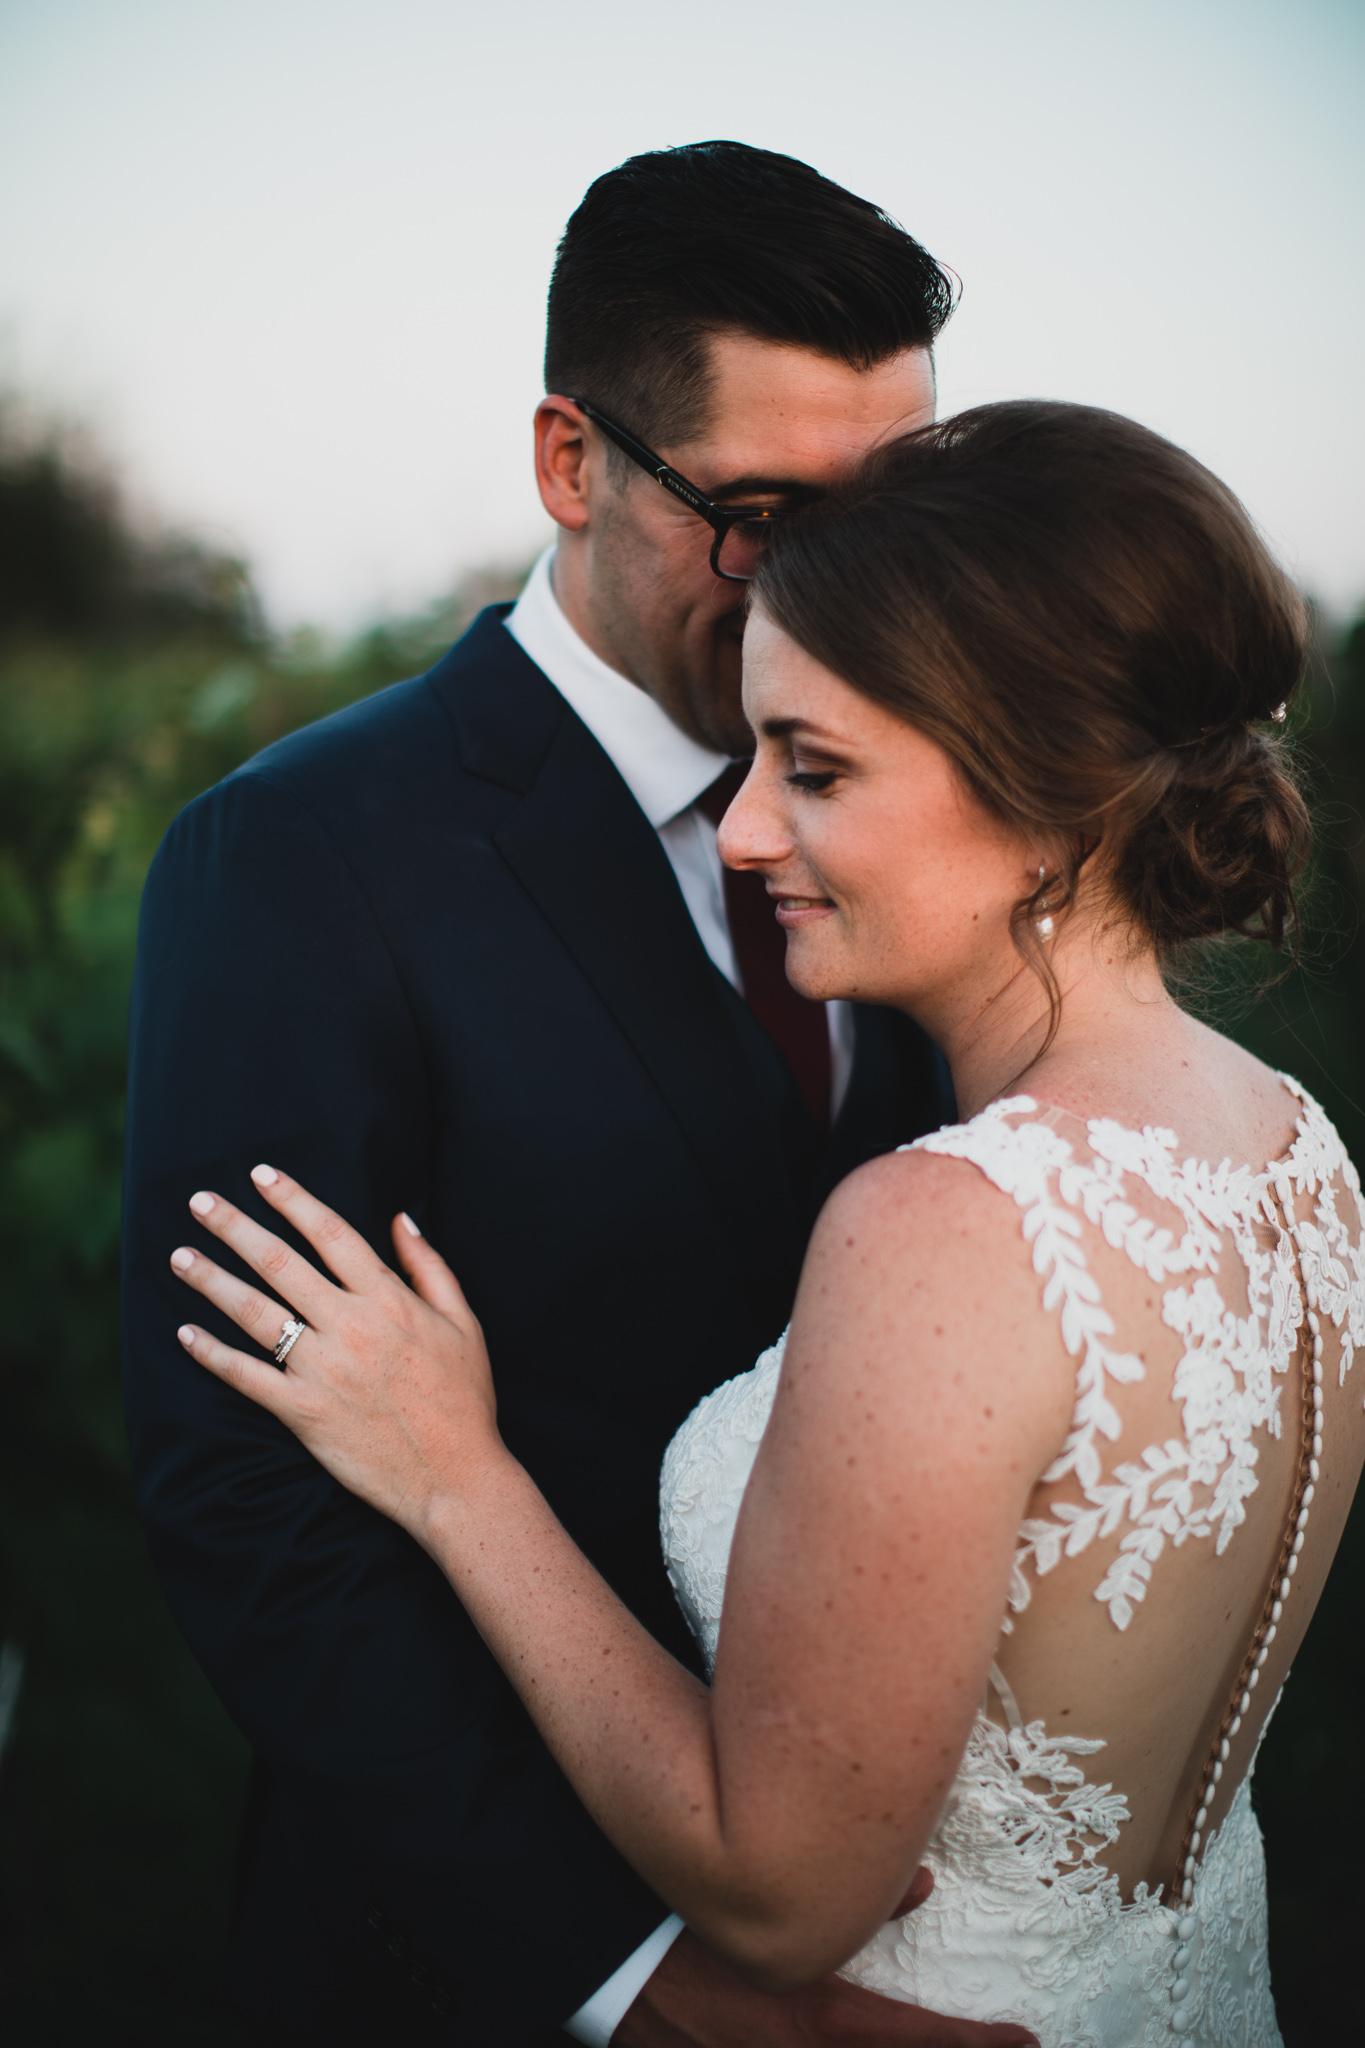 Intimate wedding photography, Lanark